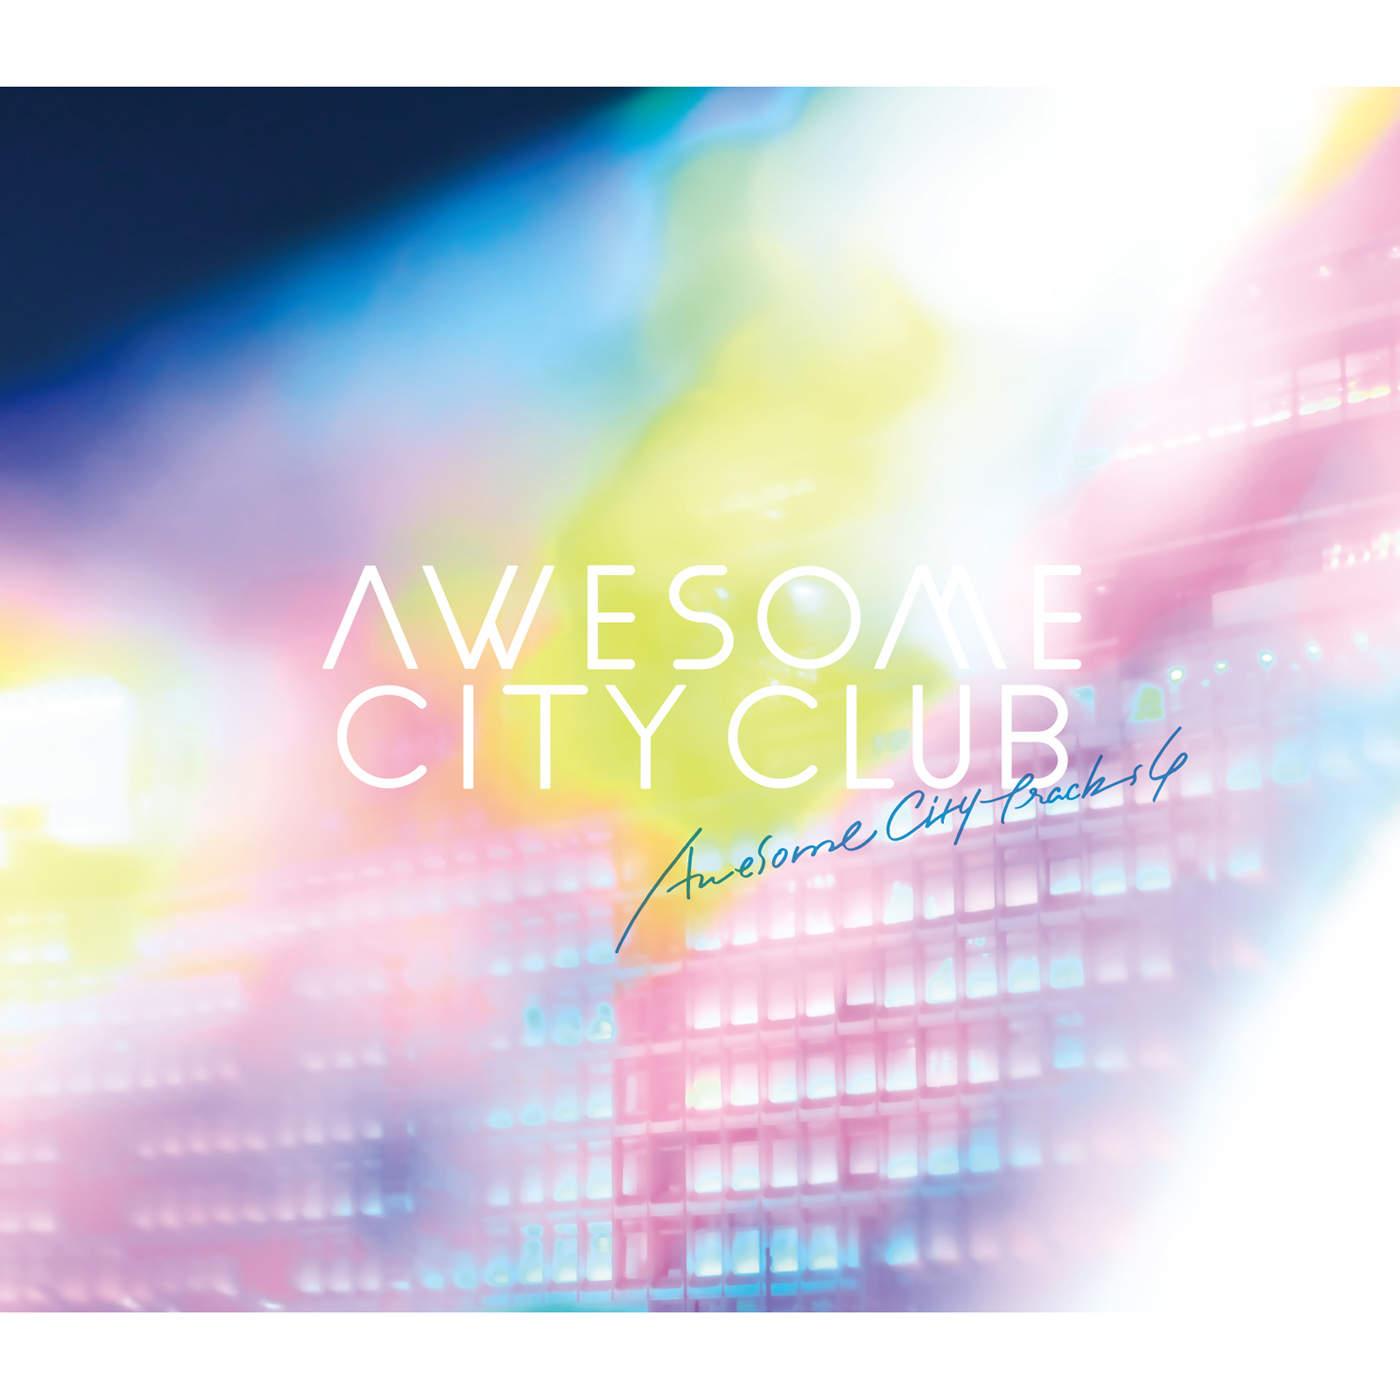 Download Lagu Awesome City Club Terbaru